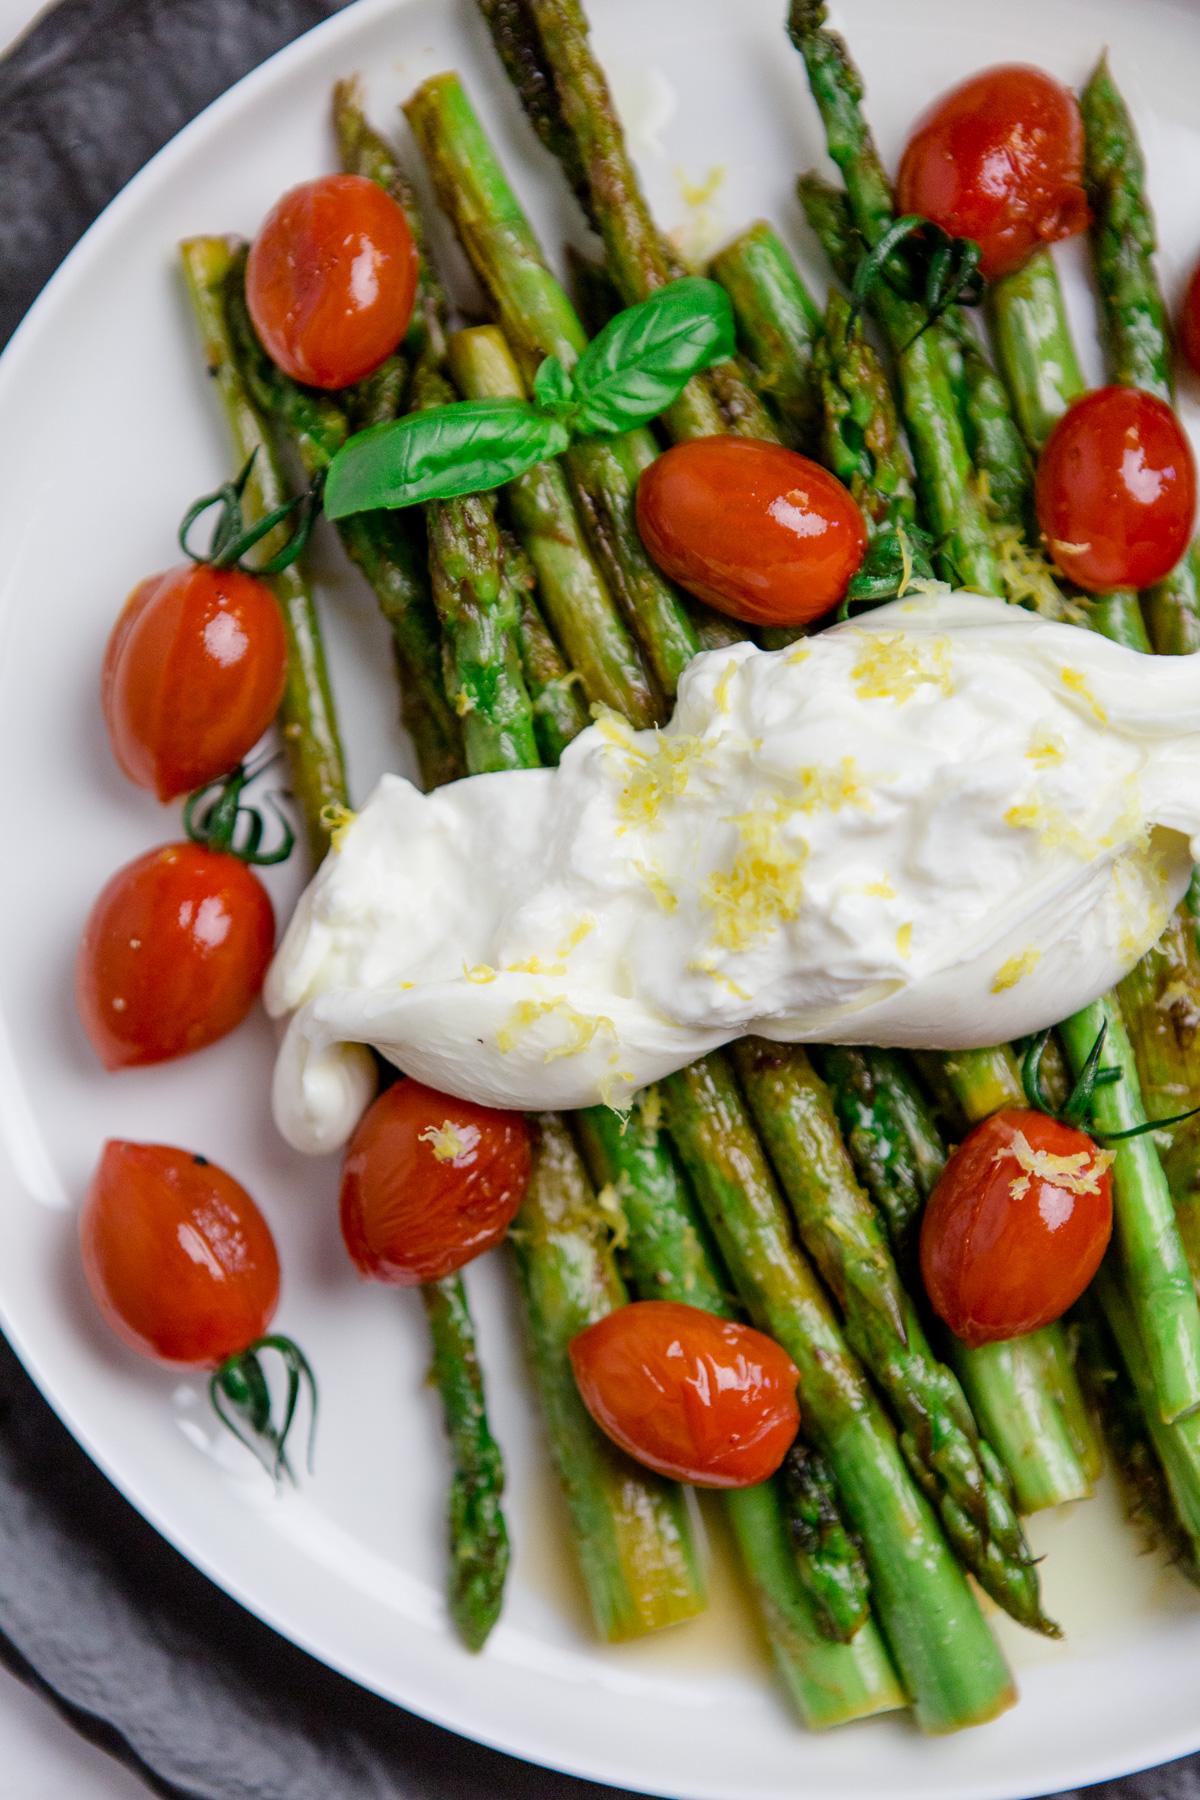 Gebratener Spargel mit Tomaten und Zitronen-Burrata - https://kuechenchaotin.de